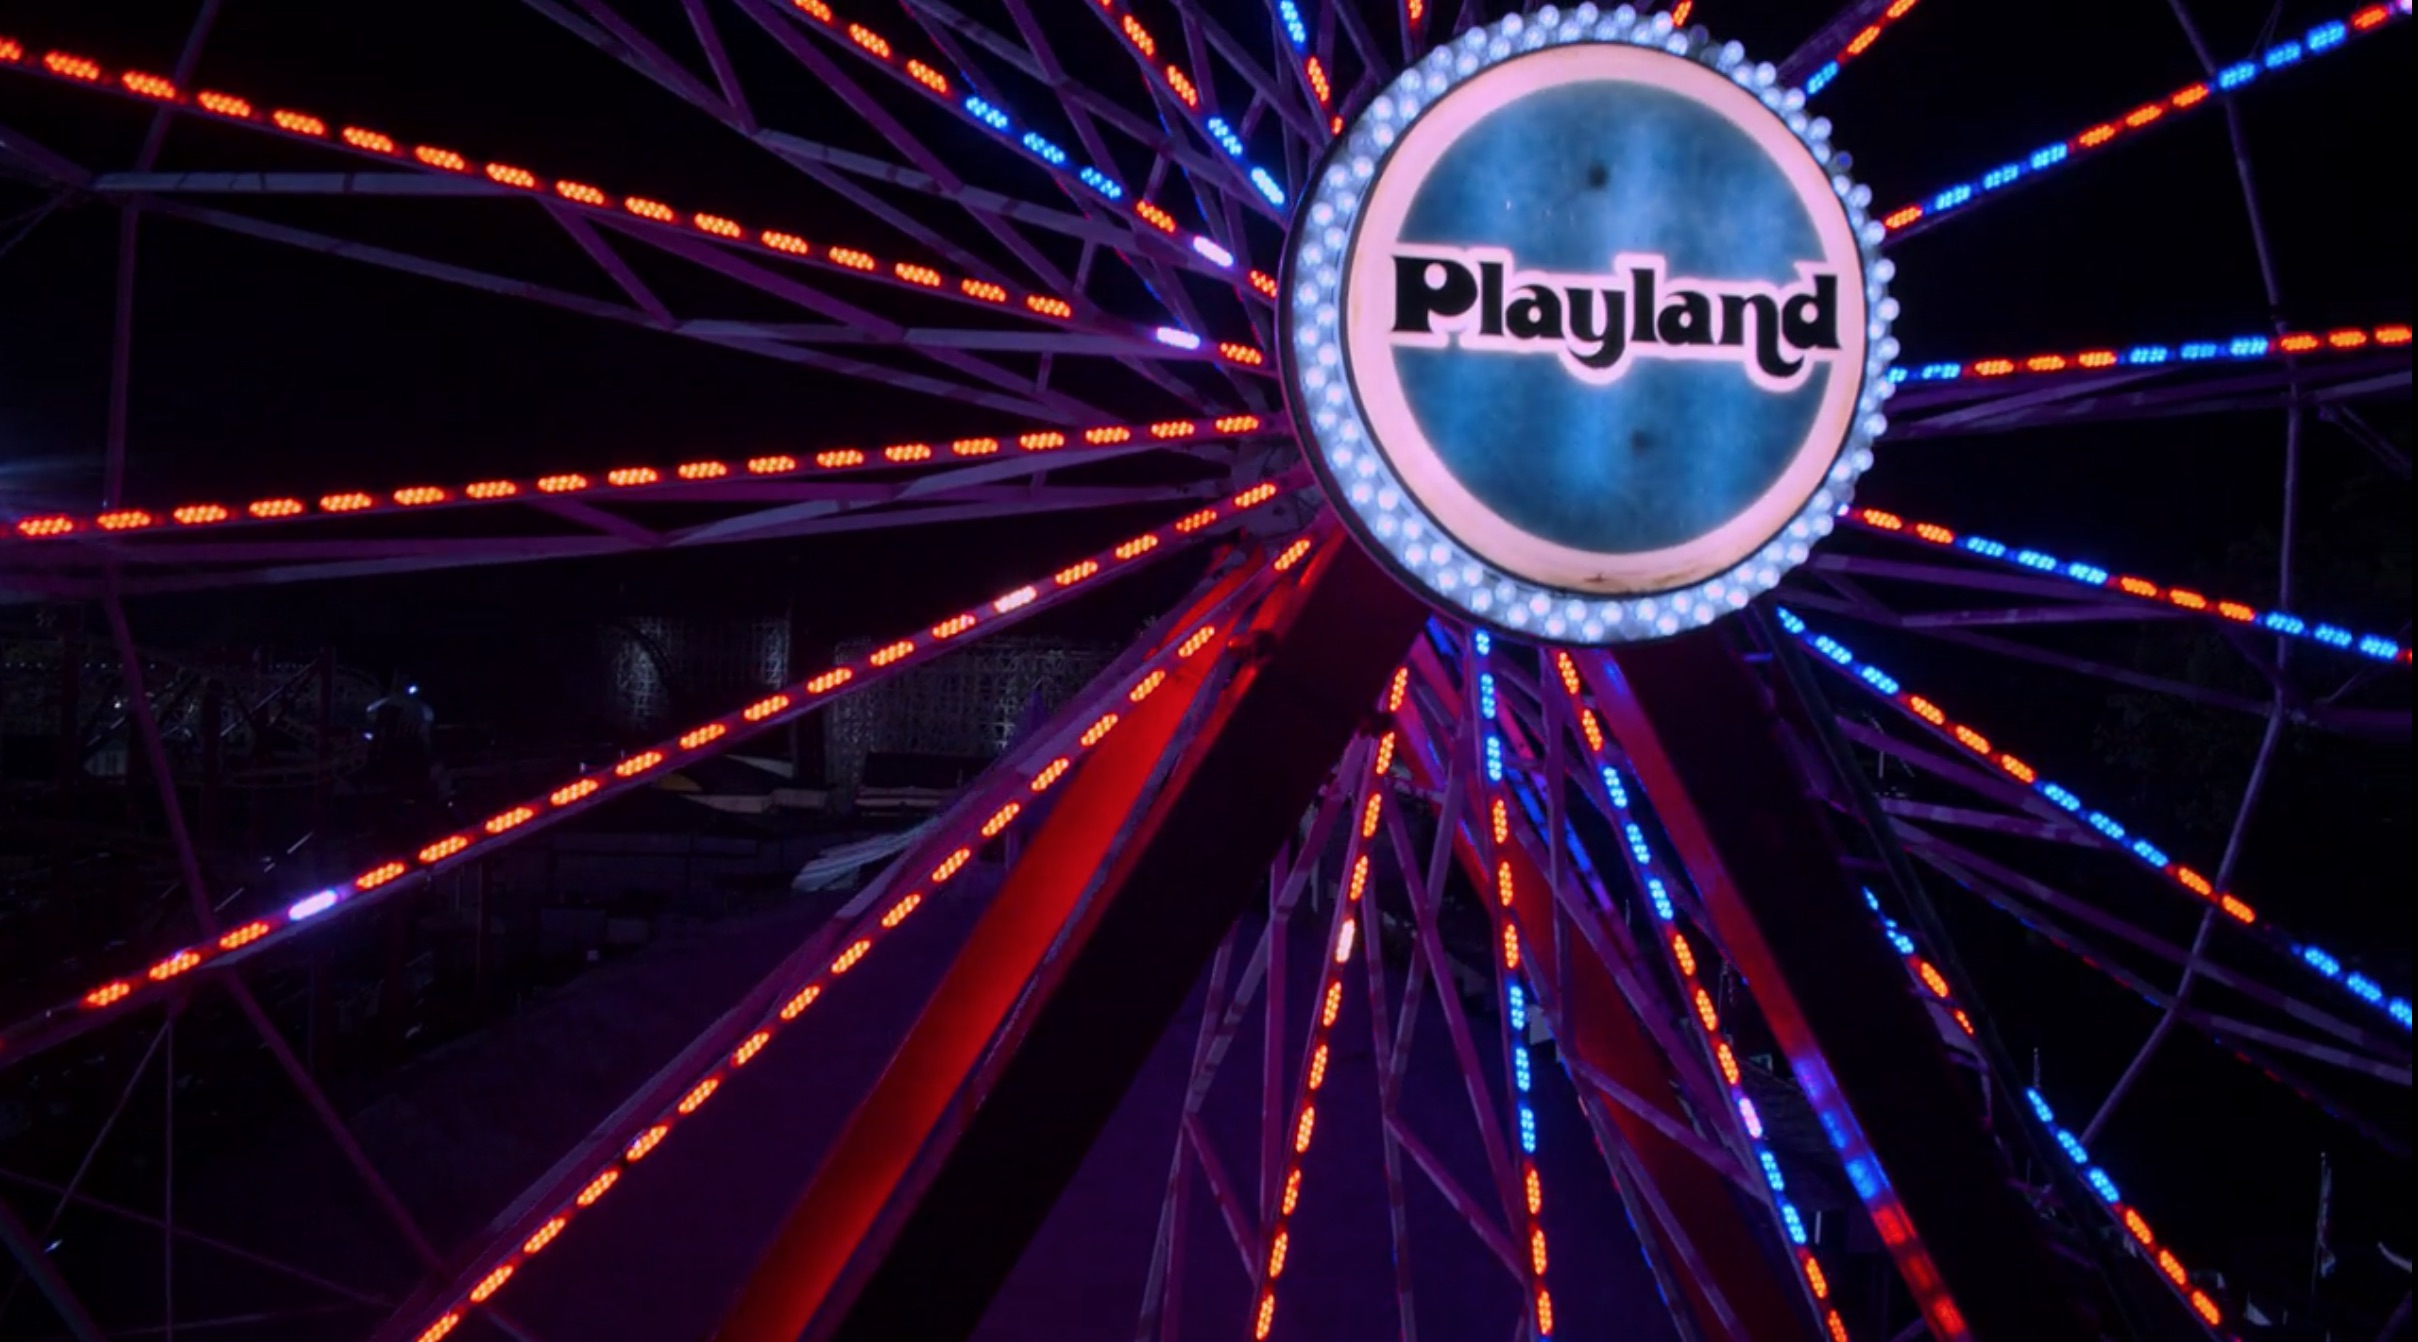 Playland (New York)/Gallery